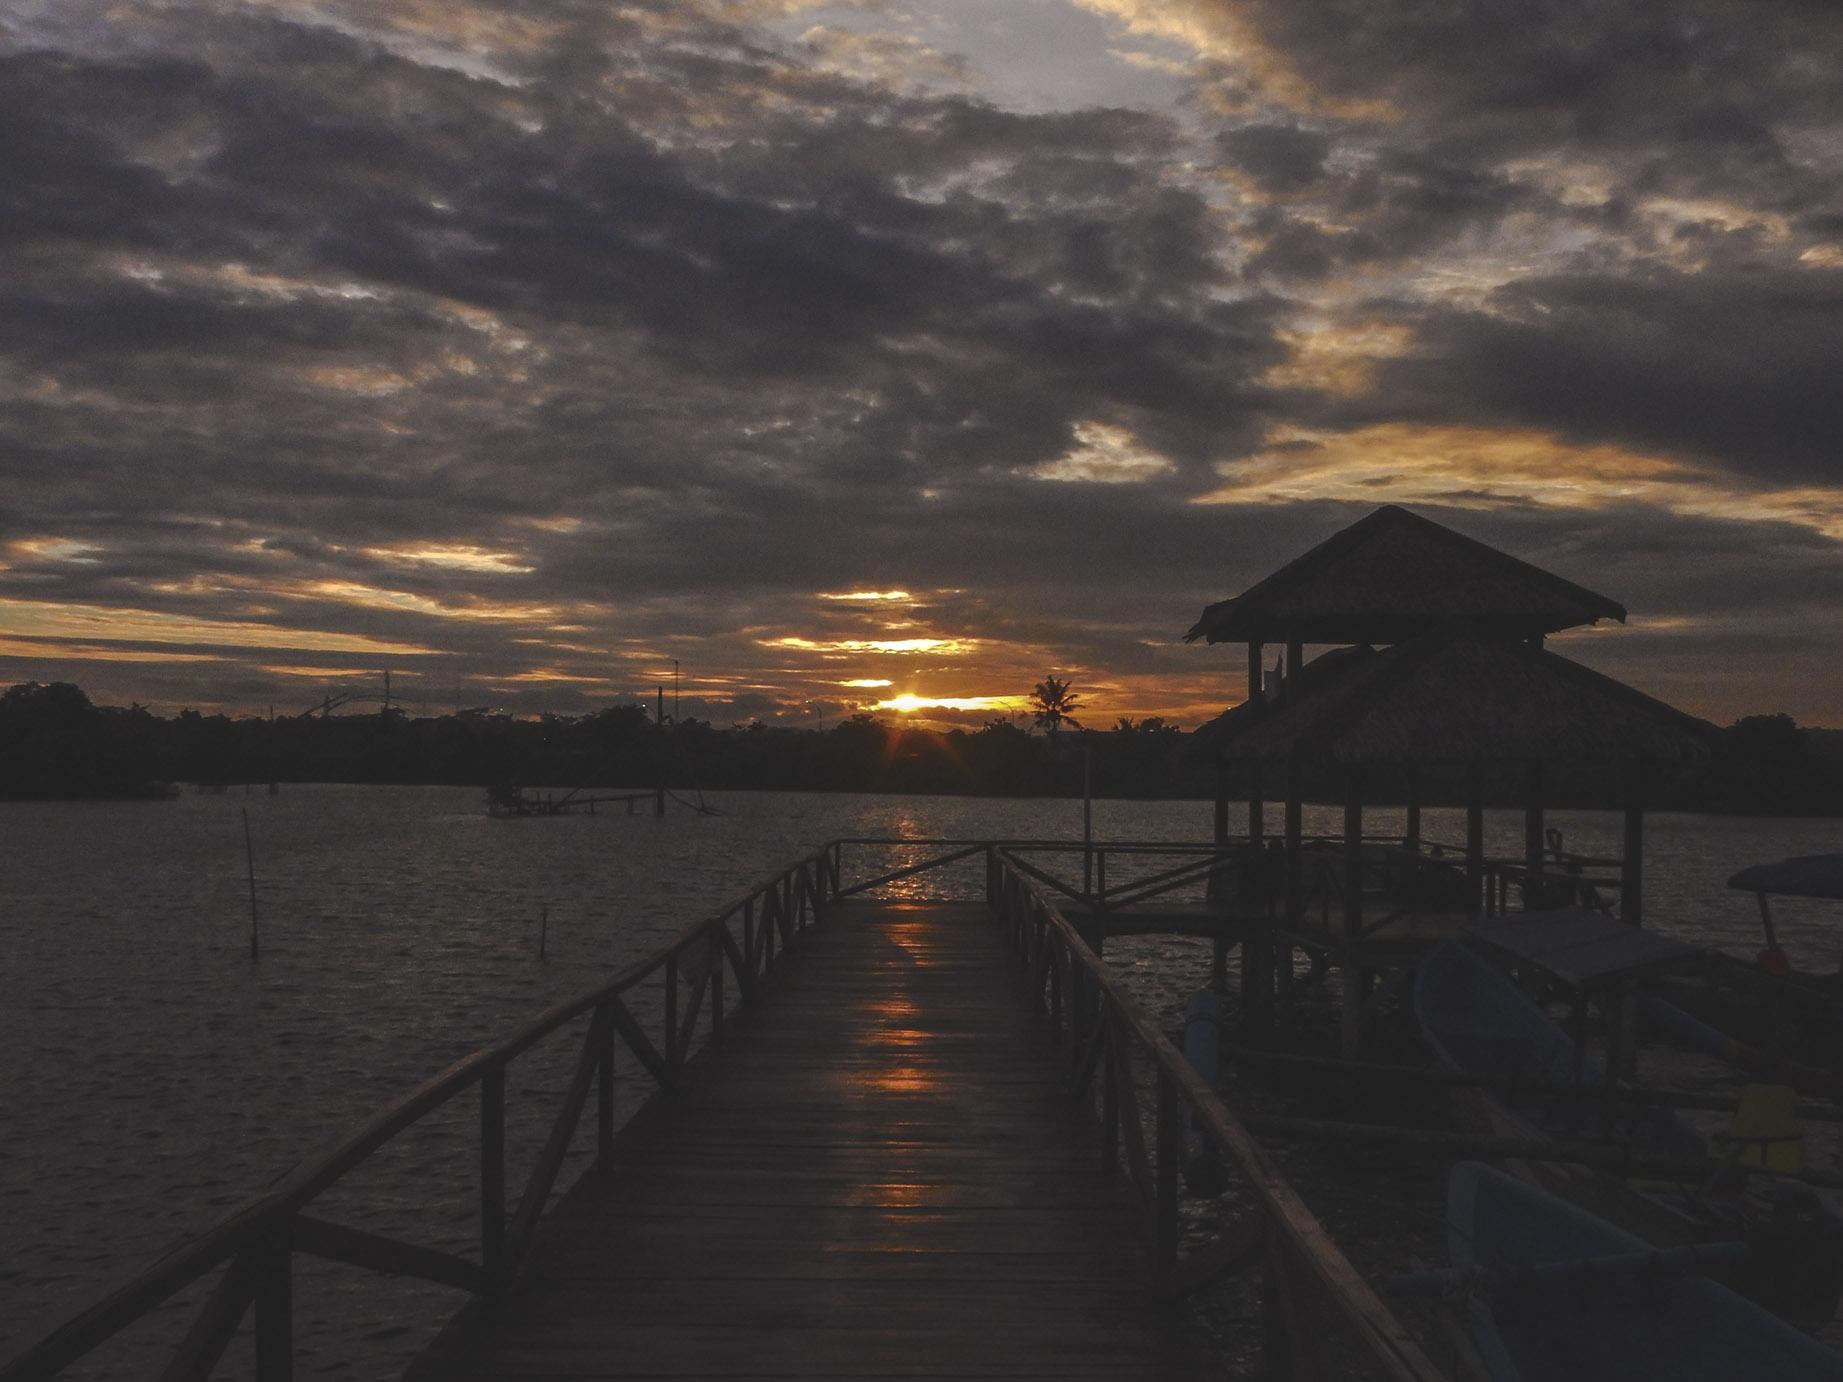 sunset time at mangrove bridge, batukaras